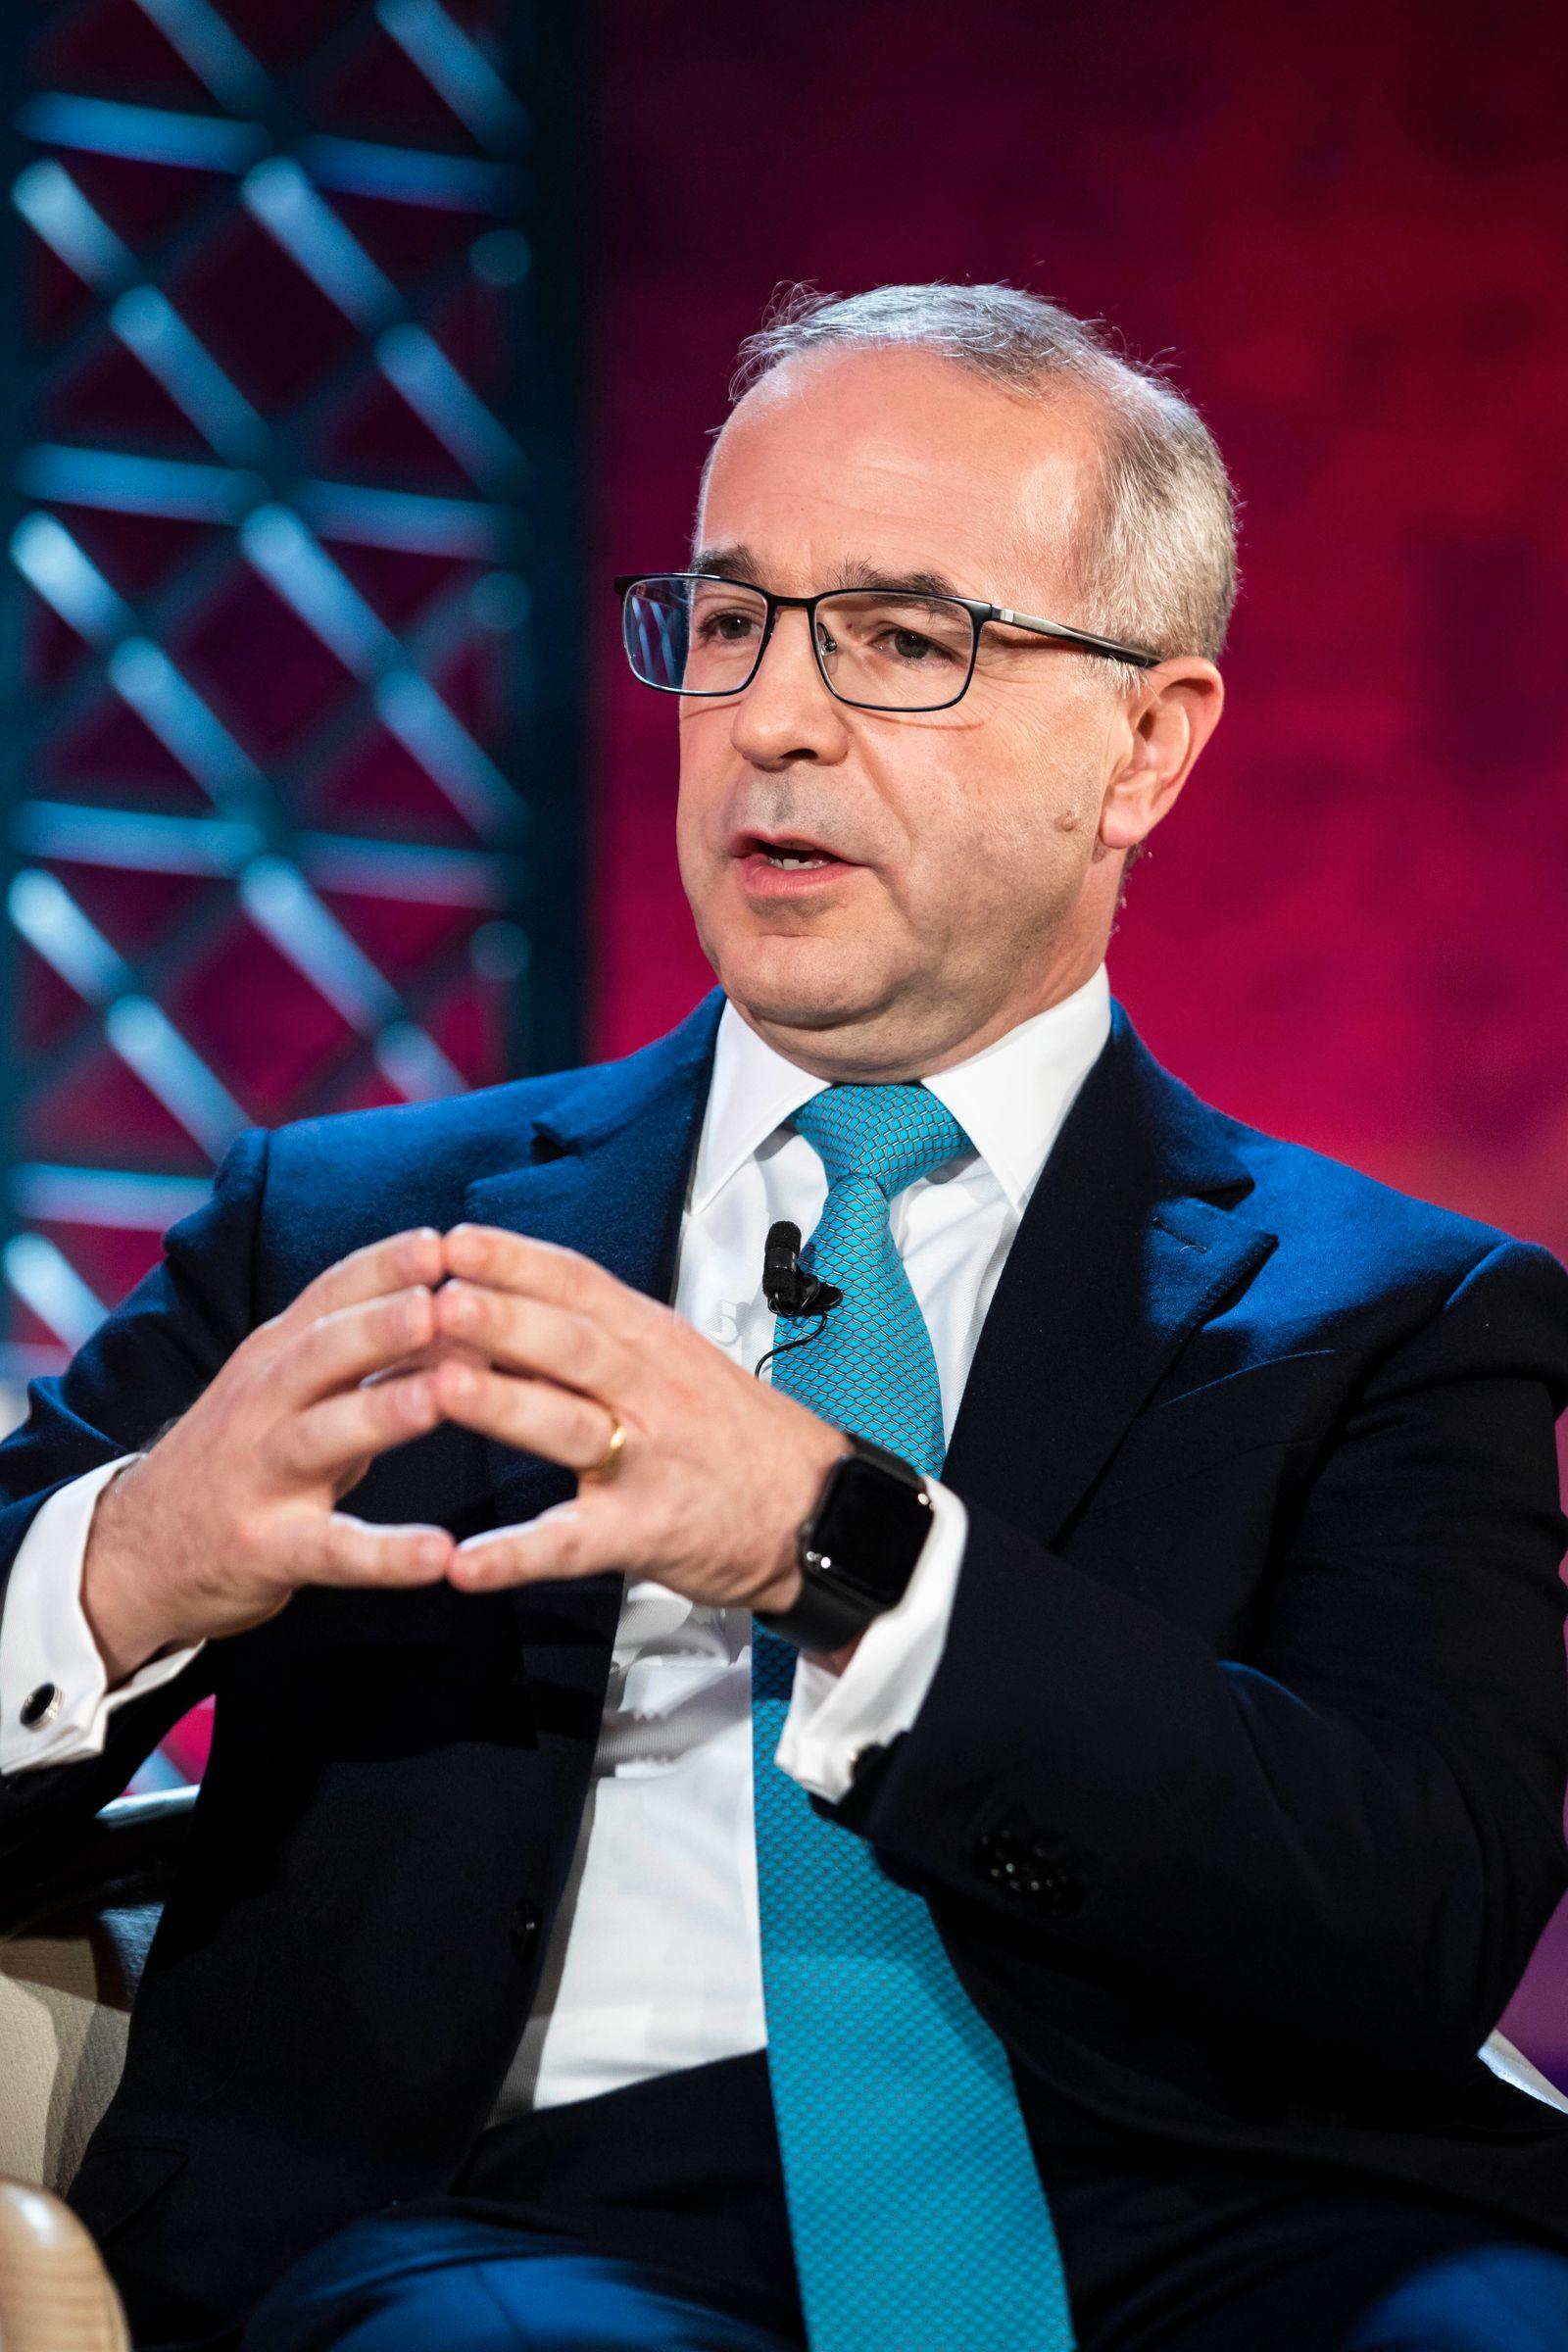 Paris, France, November 18th, 2019 - Fortune Global Forum 2019, in the presence of Kevin Sneader, Global Managing Partne